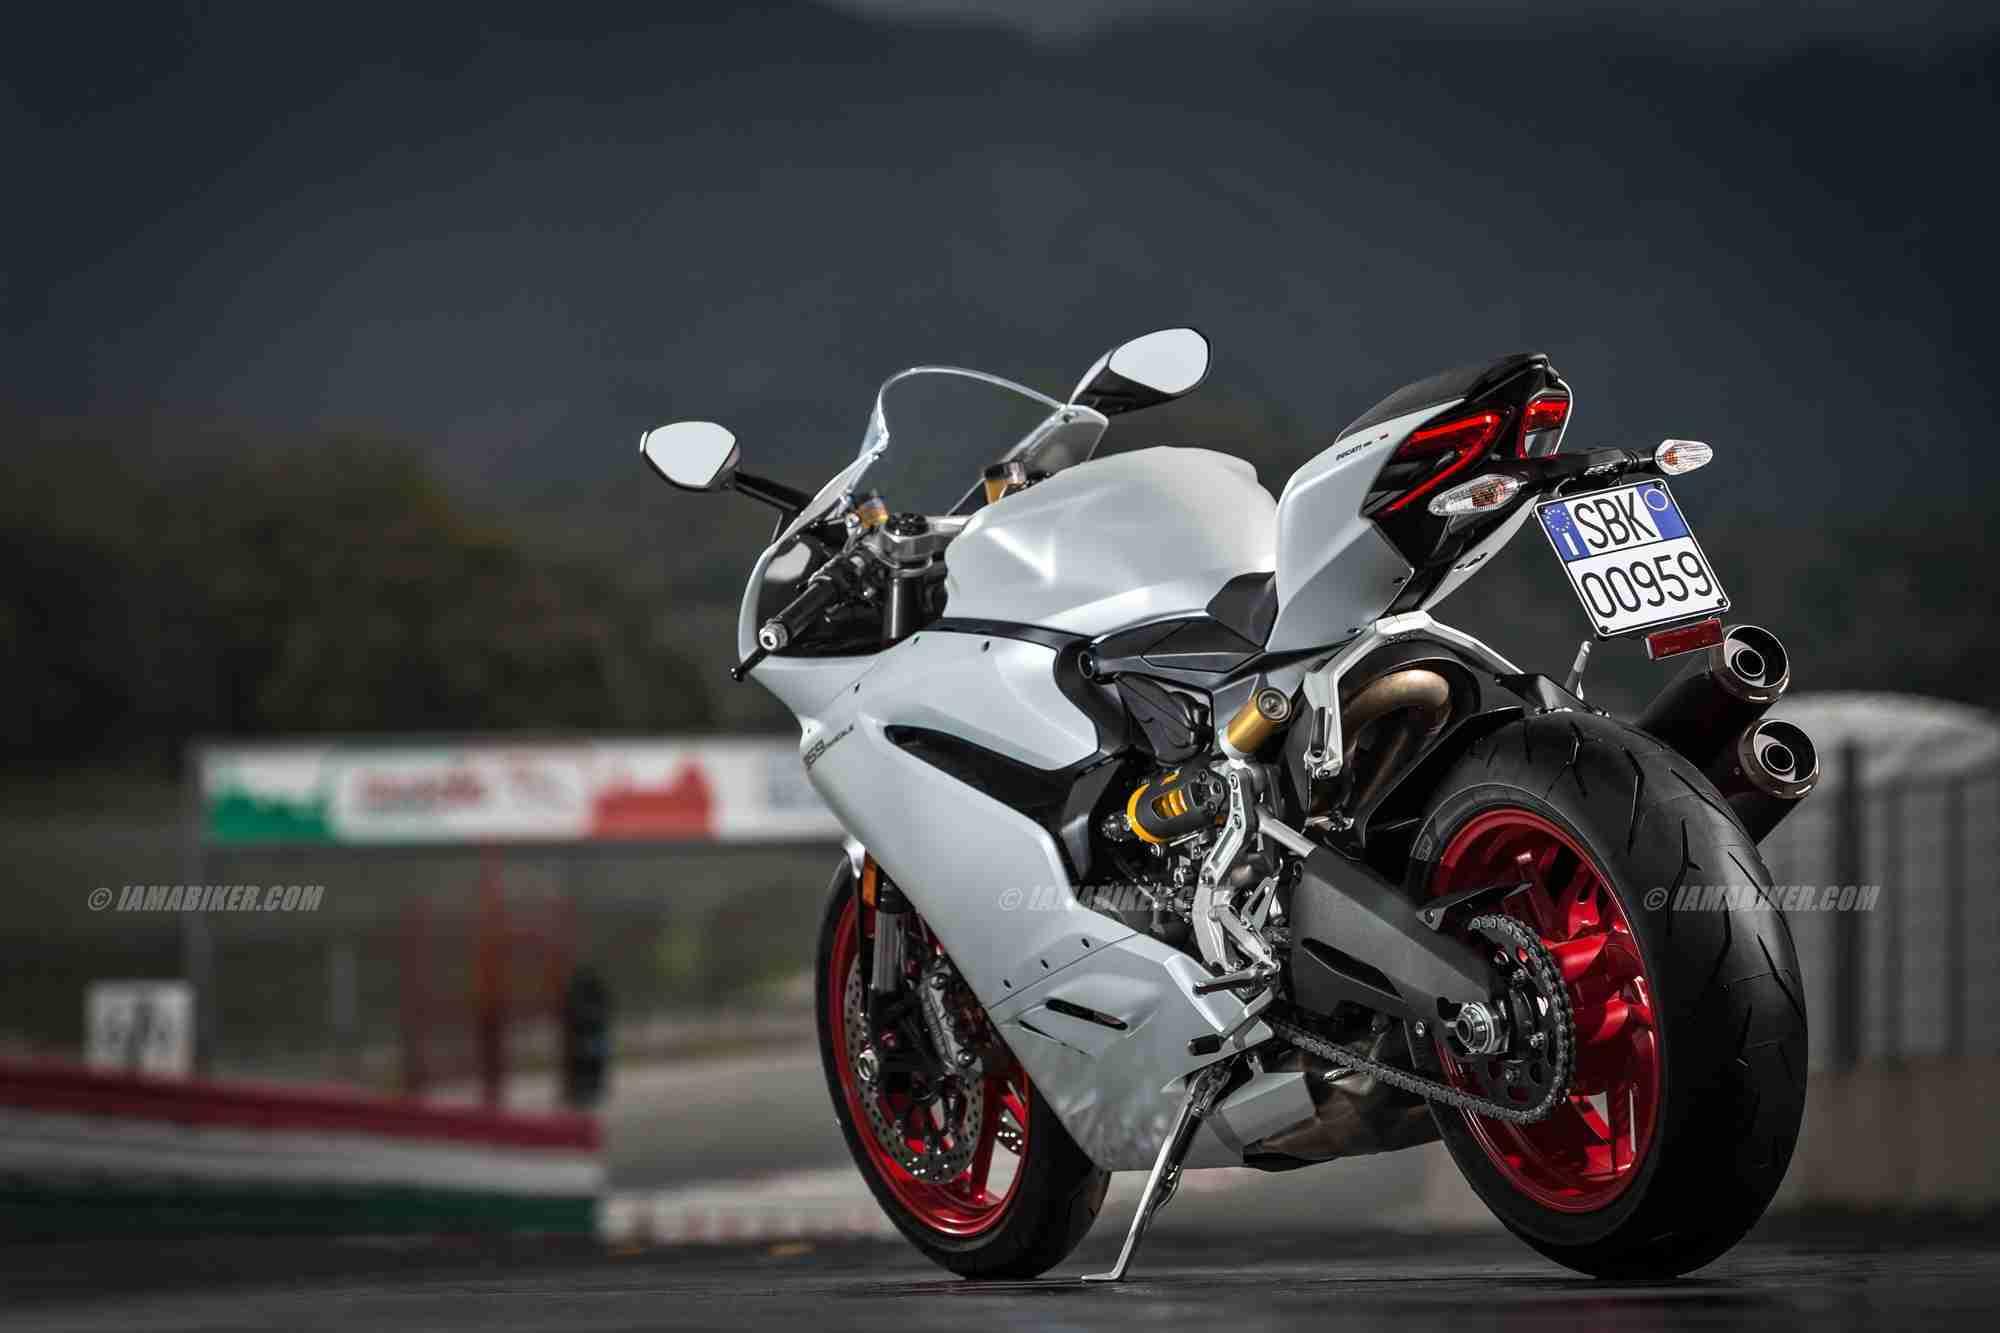 2016 Ducati 959 PANIGALE static